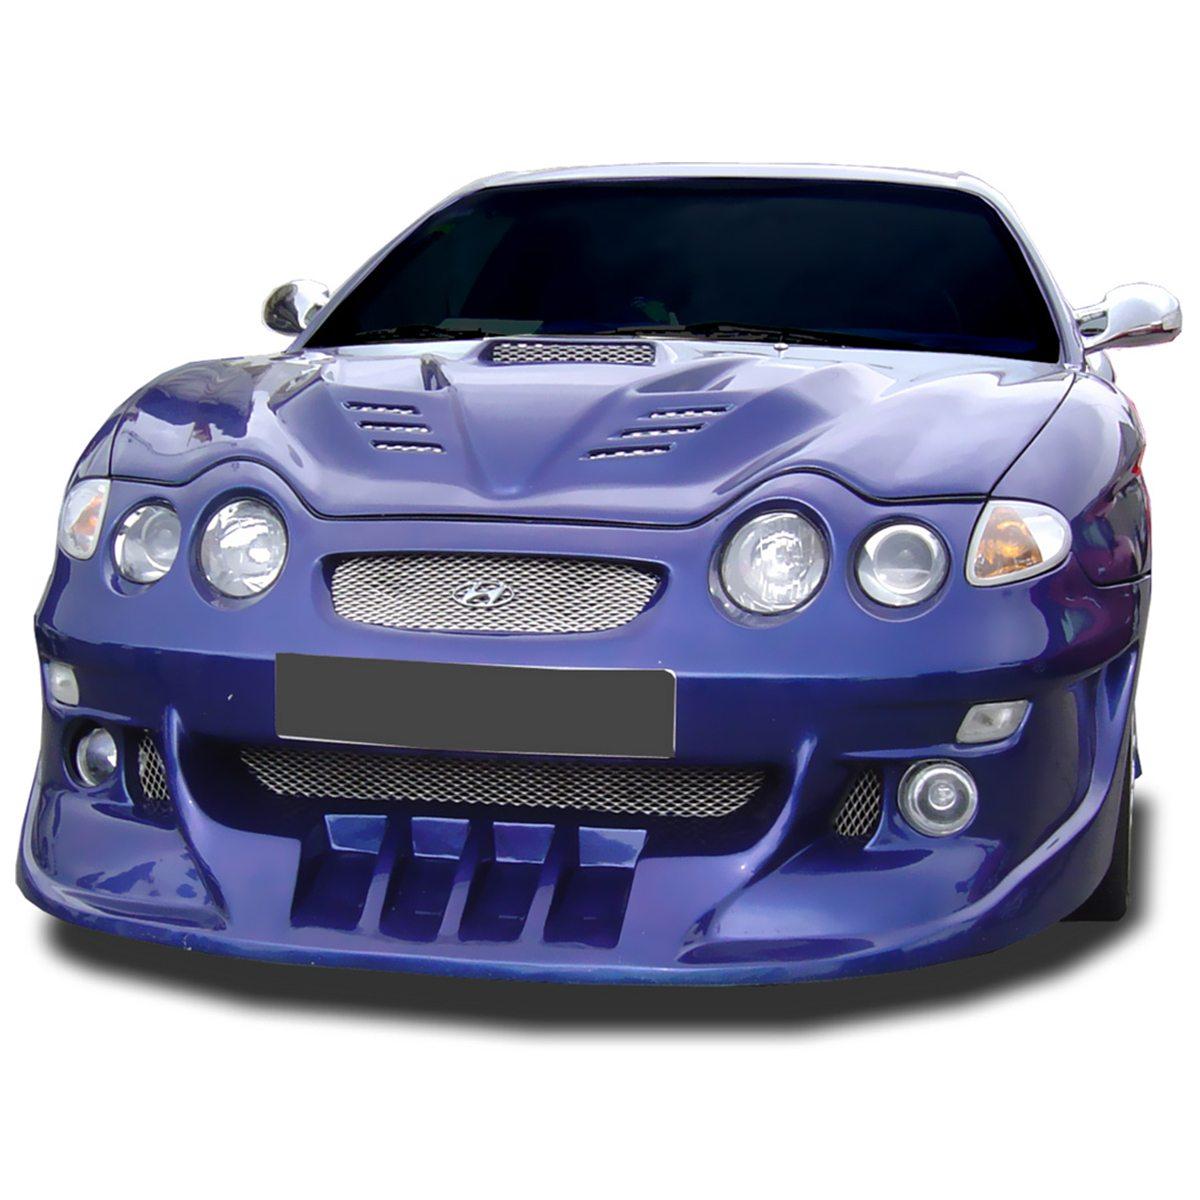 Hyundai-2000-Maniac-Frt-PCU0360